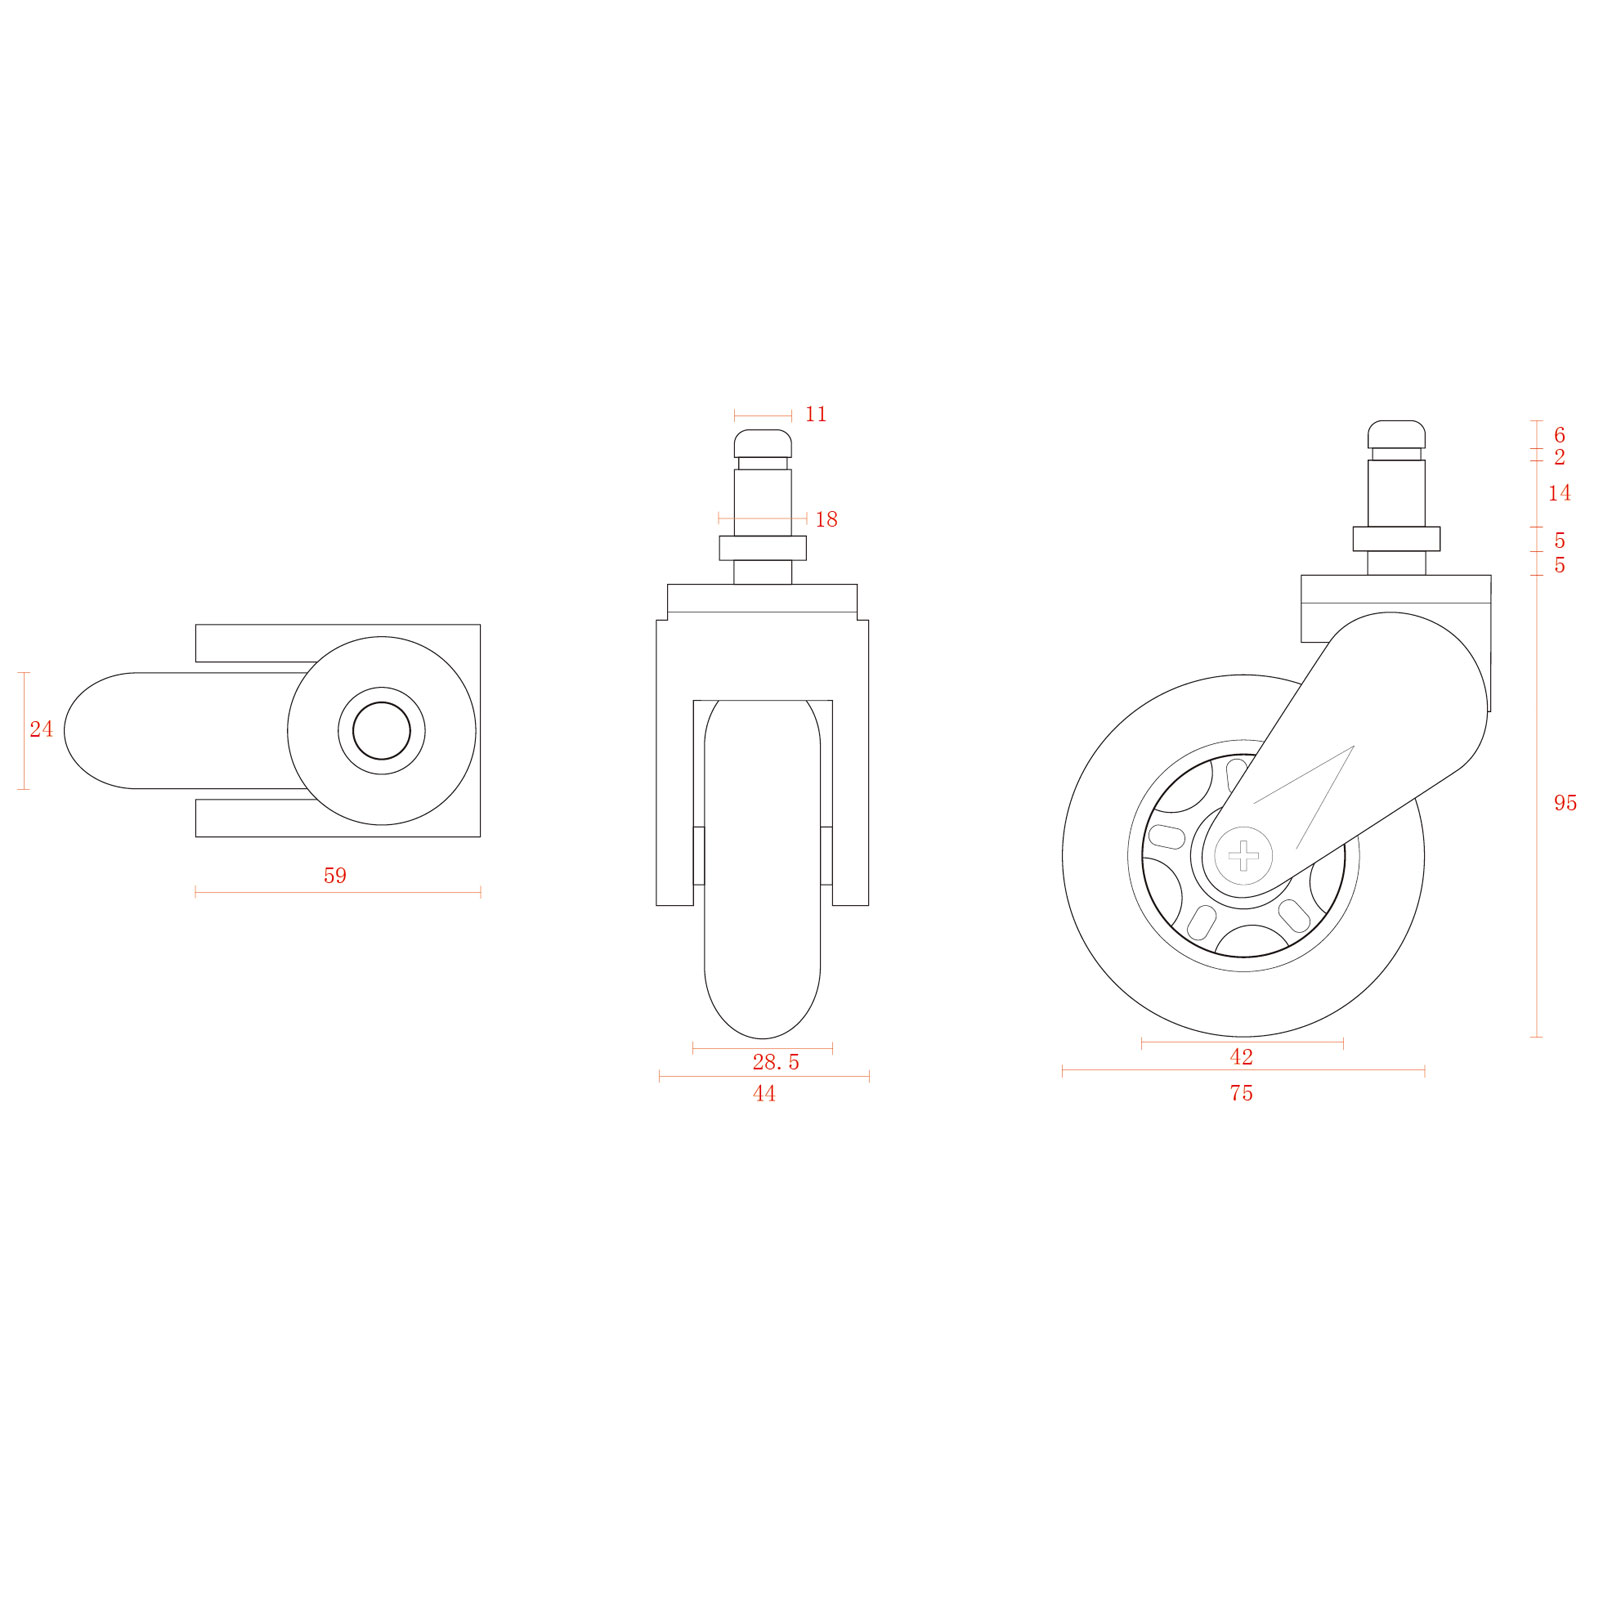 Akracing Rollerblade Casters Rouge Autres Accessoires Jeu